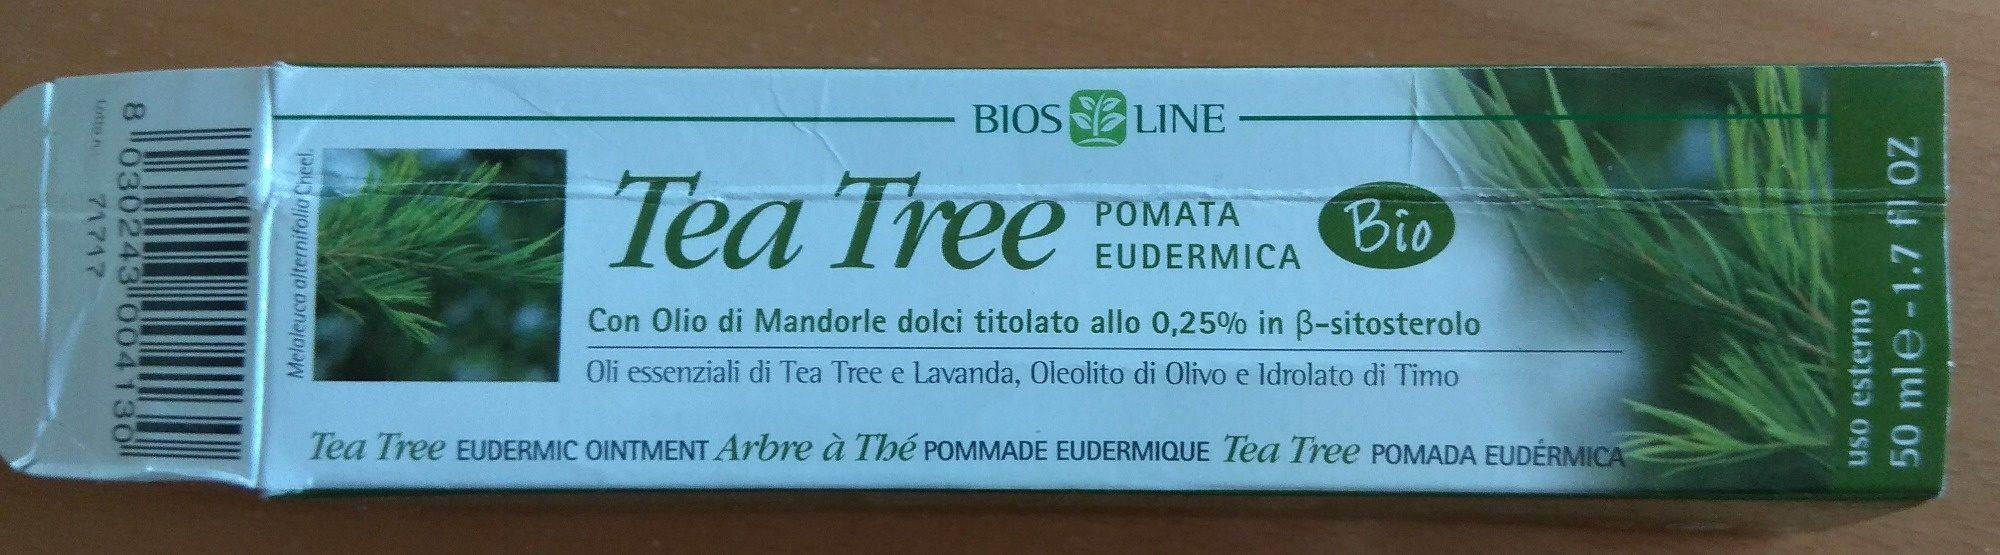 Tea Tree pomata eudermica - Product - it